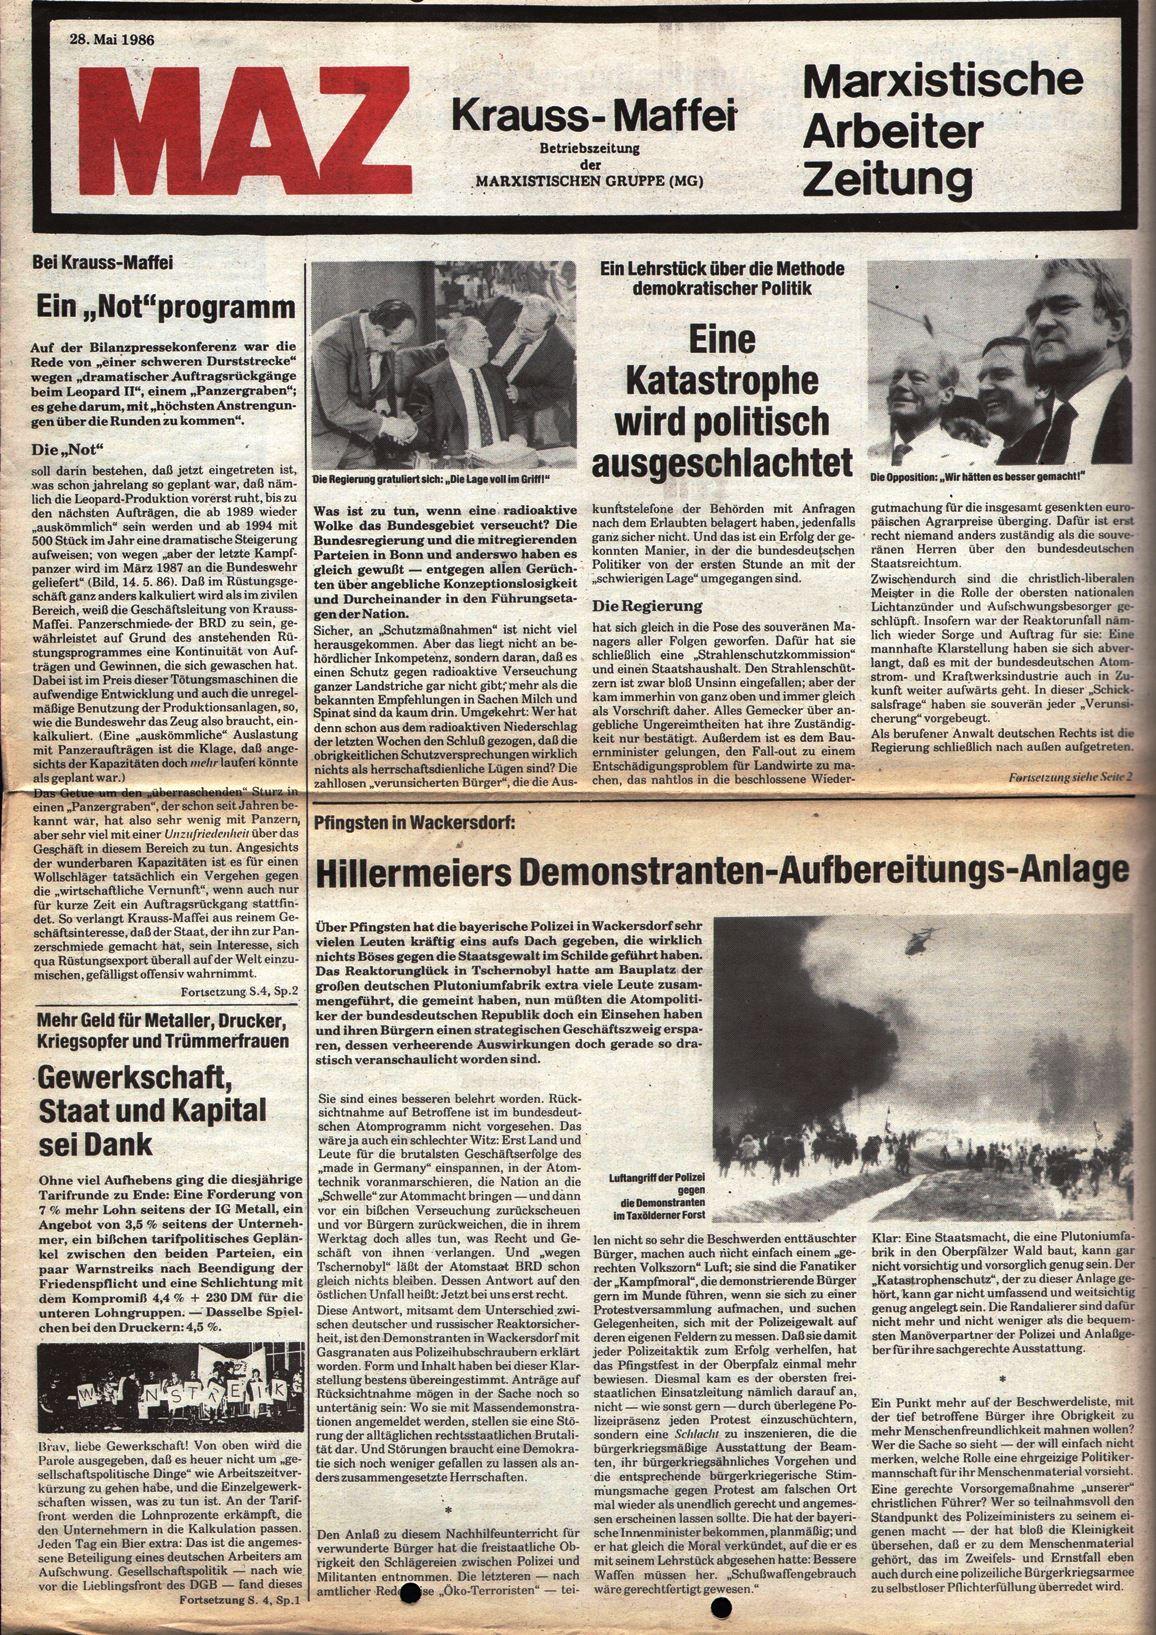 Muenchen_MG_MAZ_Krauss_Maffei_19860528_01